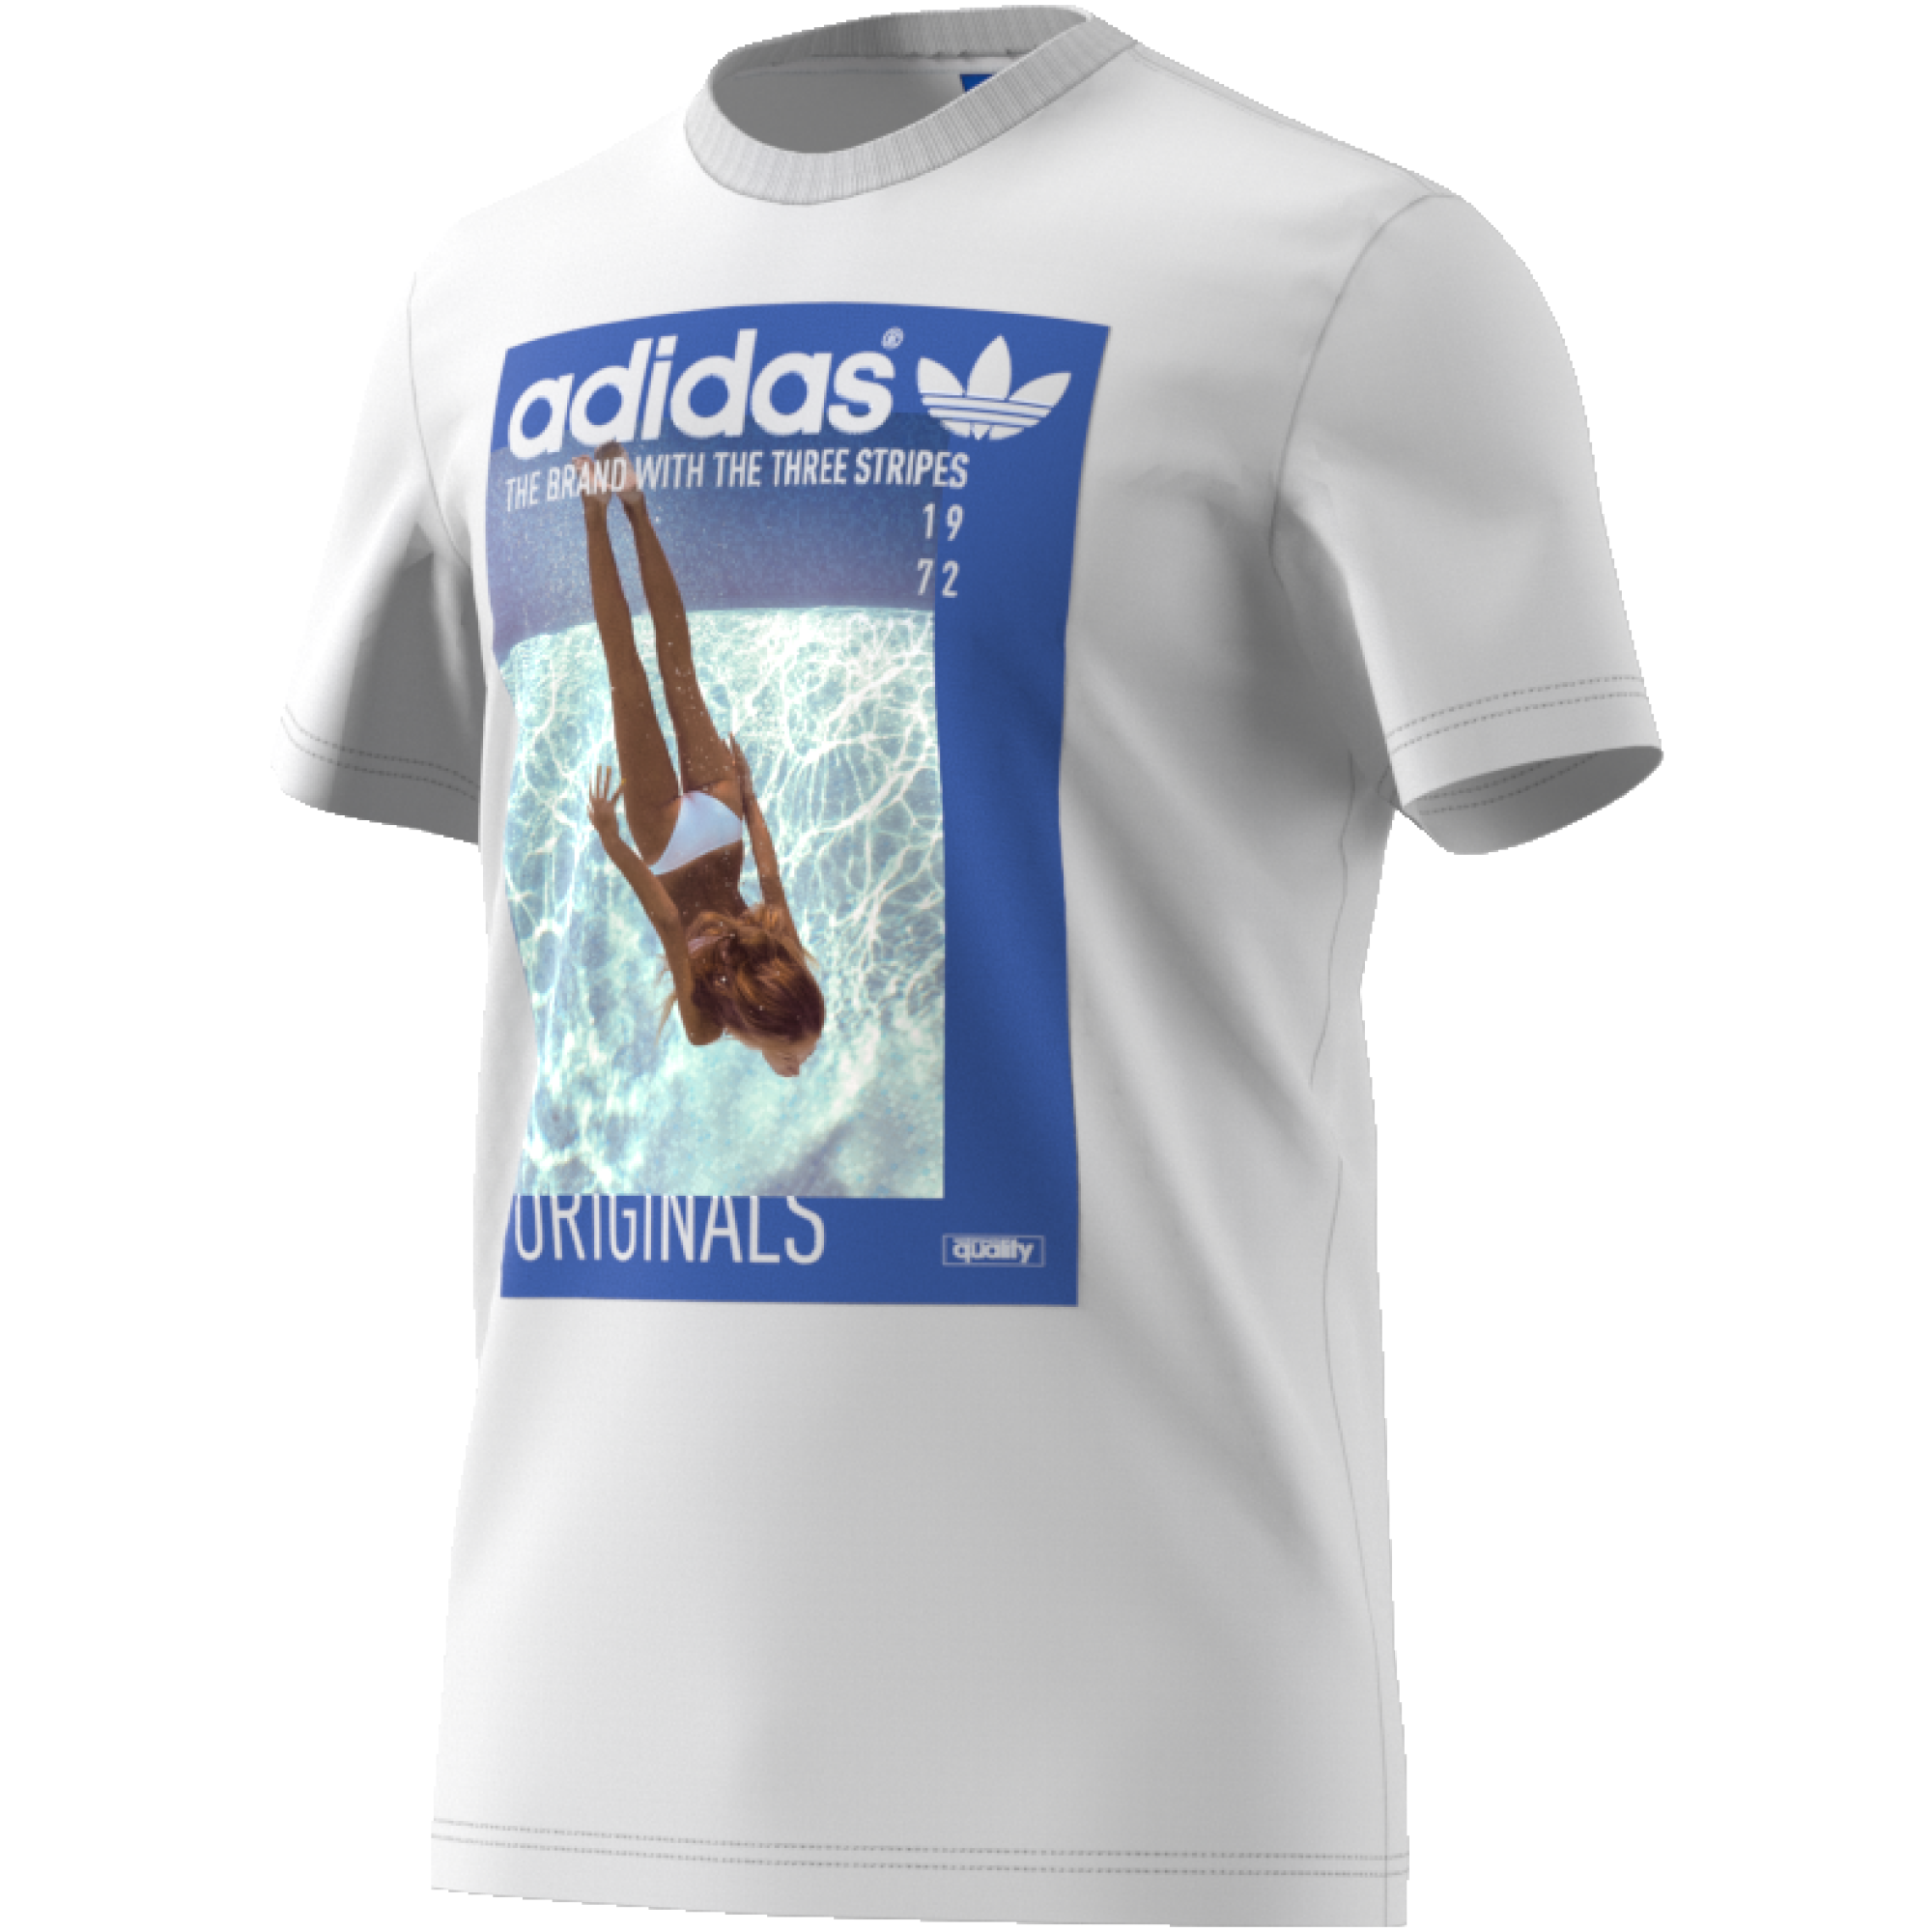 4bd71ecde9 Adidas póló , Férfi ruházat   póló   adidas_originals   Adidas póló